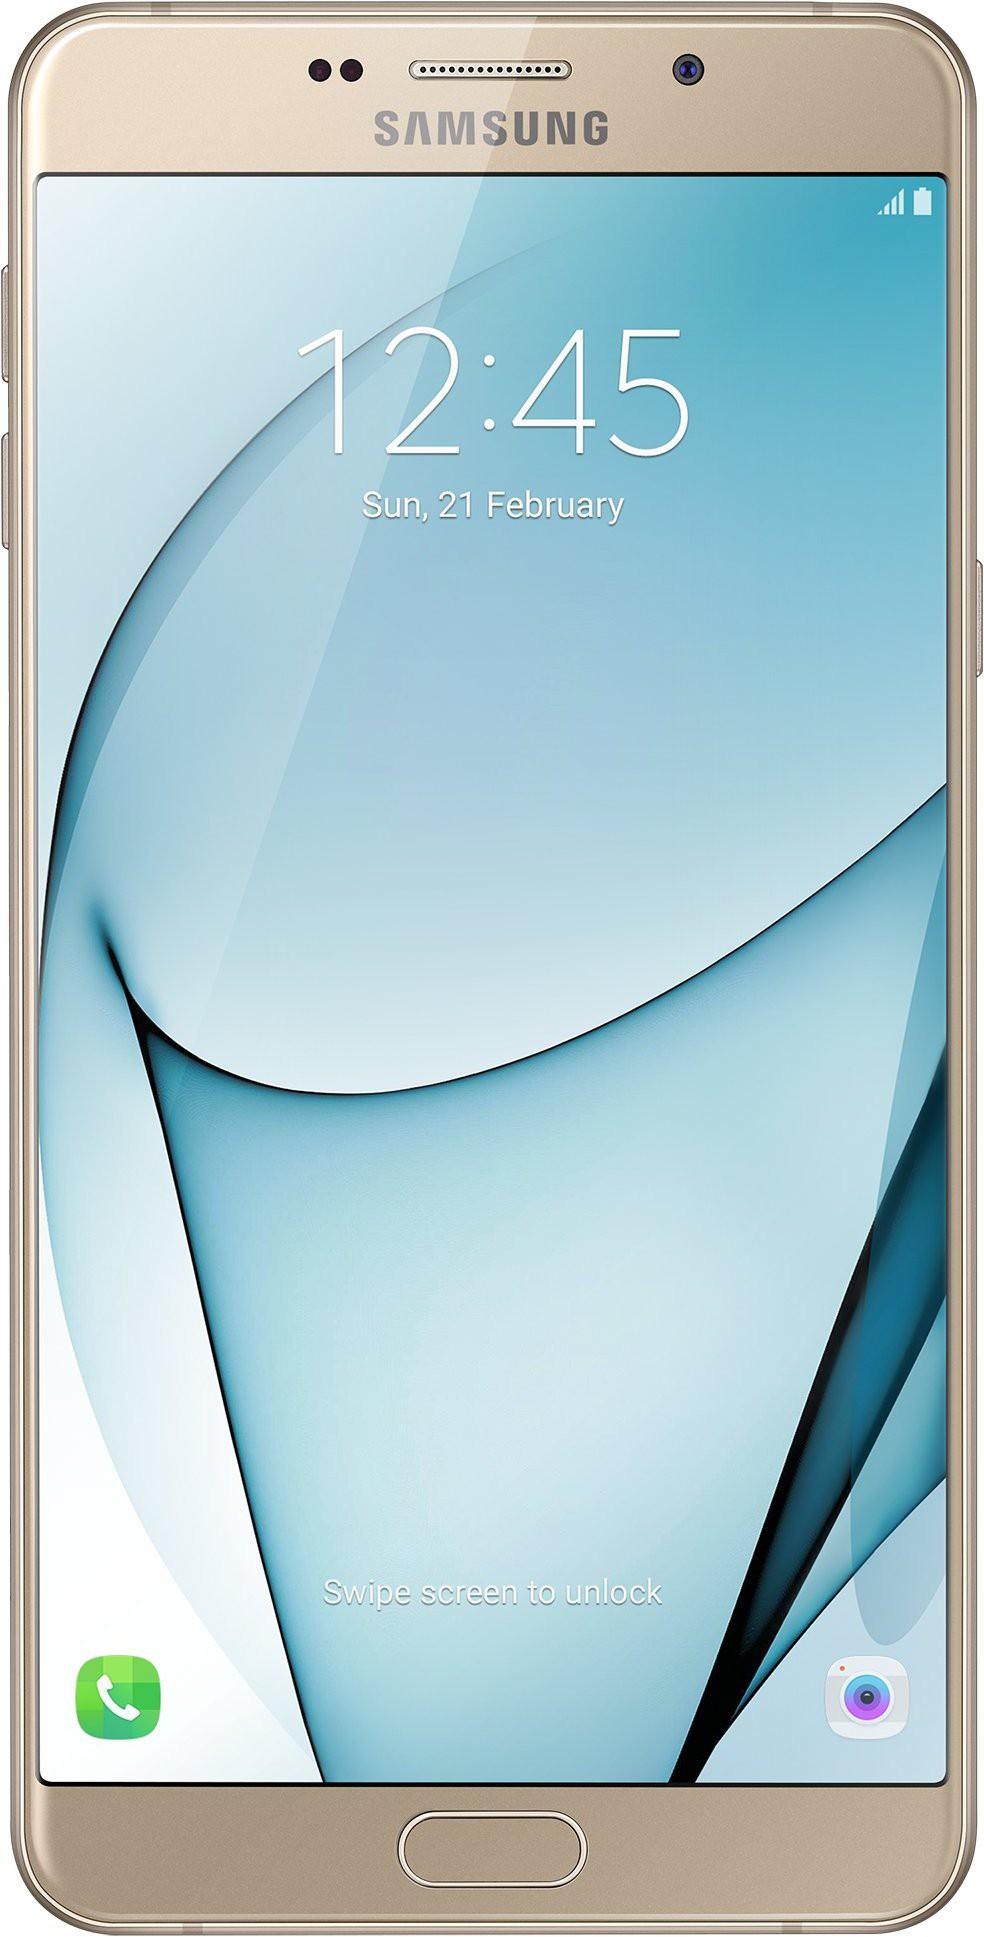 Samsung Galaxy A9 Pro (Gold, 32 GB)(4 GB RAM) image